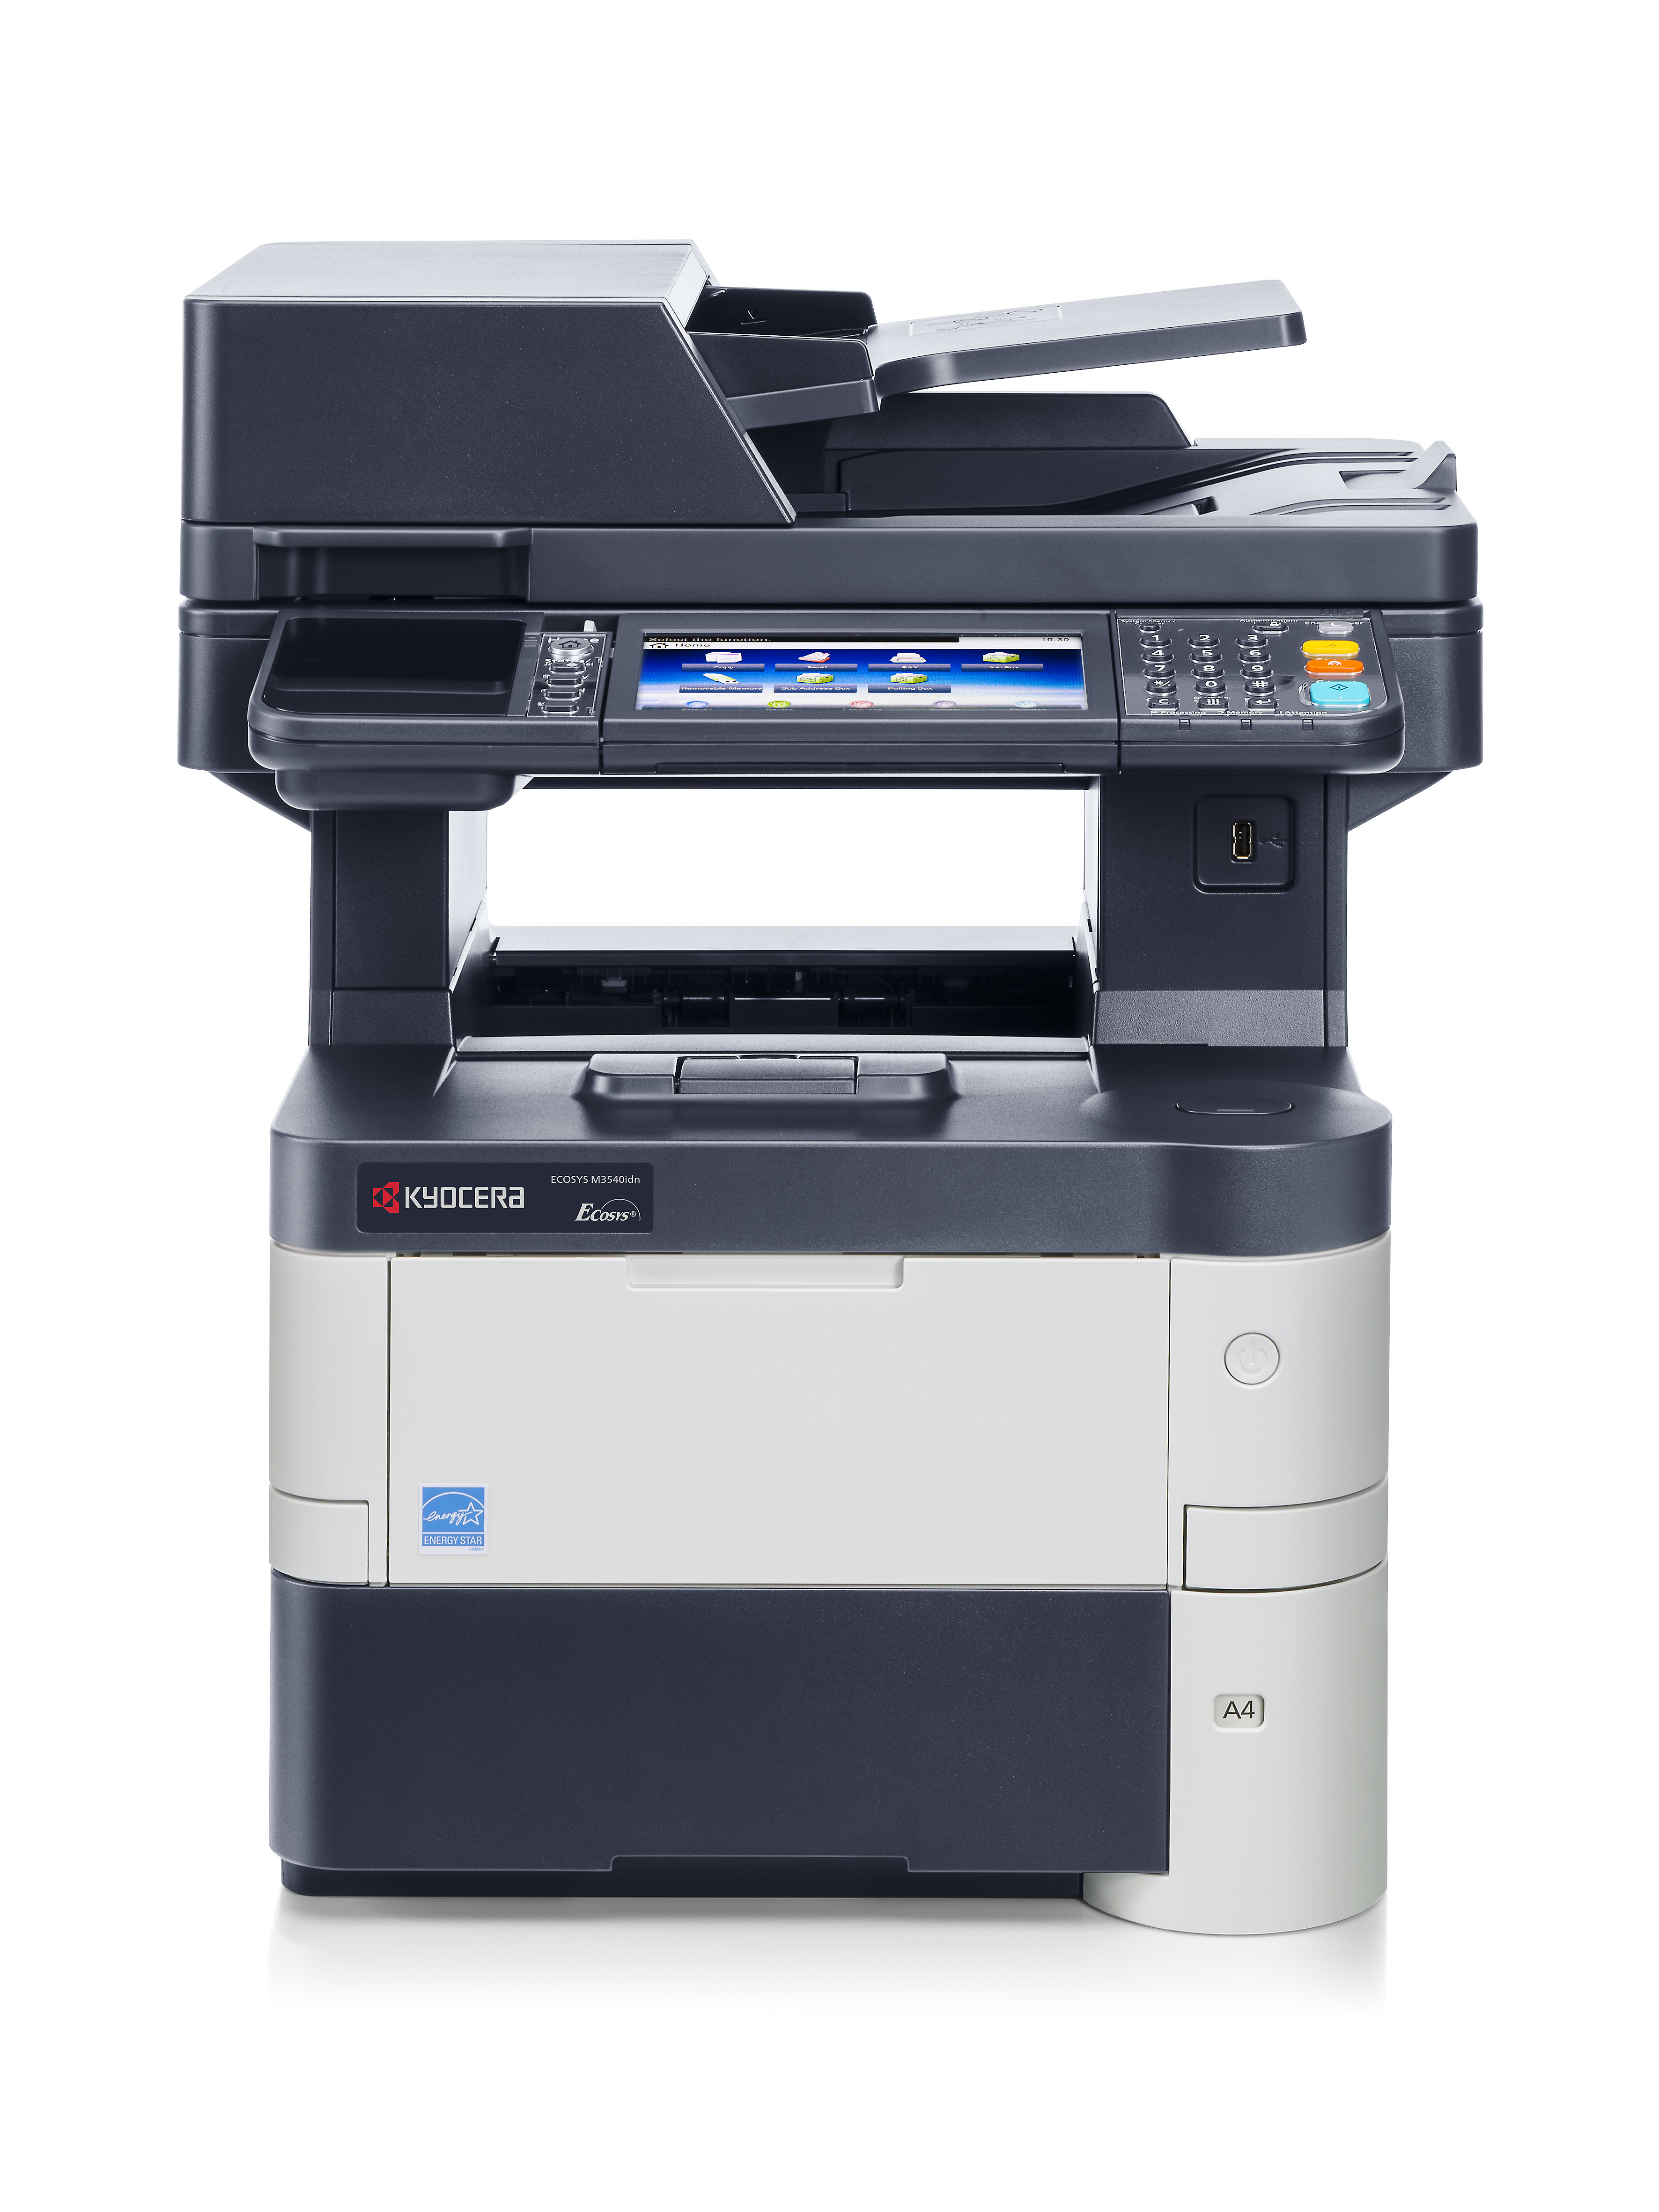 KYOCERA ECOSYS M3540idn/KL3 mono Laserdrucker 40ppm print scan copy fay +KYOLife 3Jahre